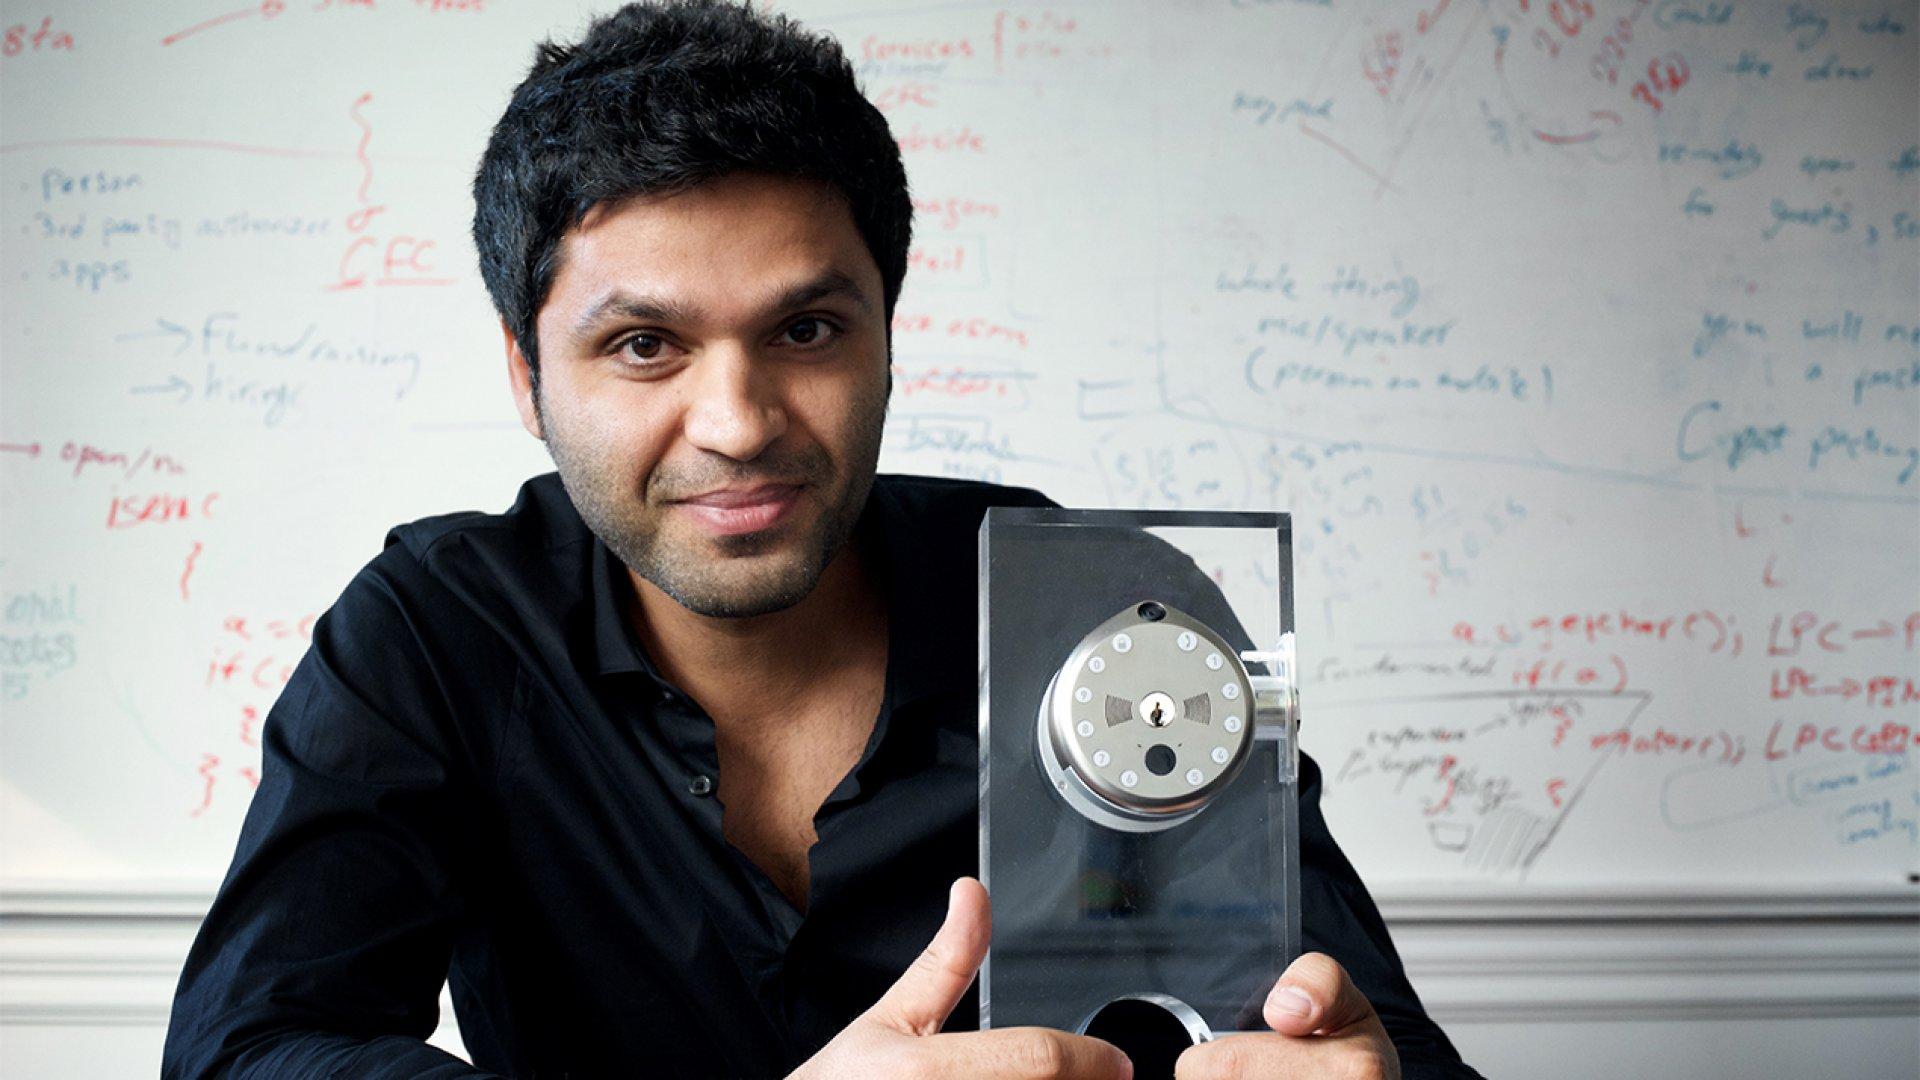 Founder Ehsan Saeedi holding a Gate smart lock unit.